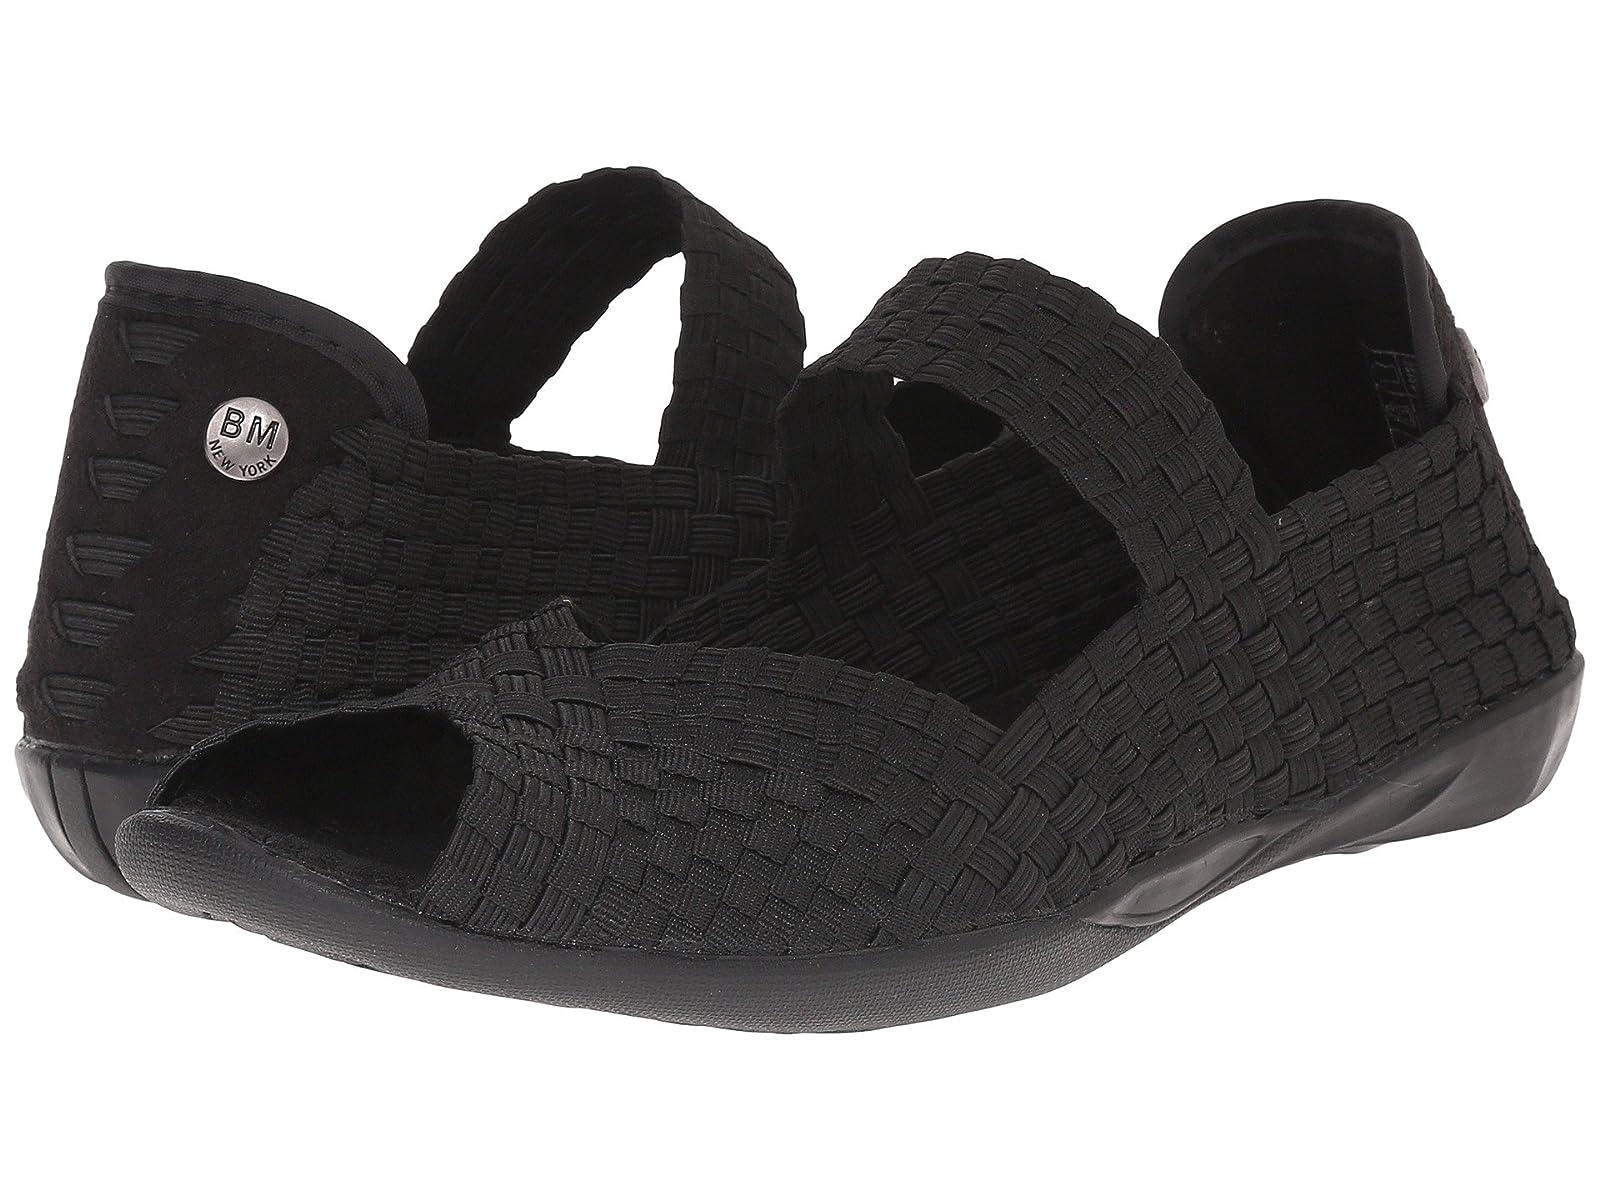 bernie mev. ChickAtmospheric grades have affordable shoes